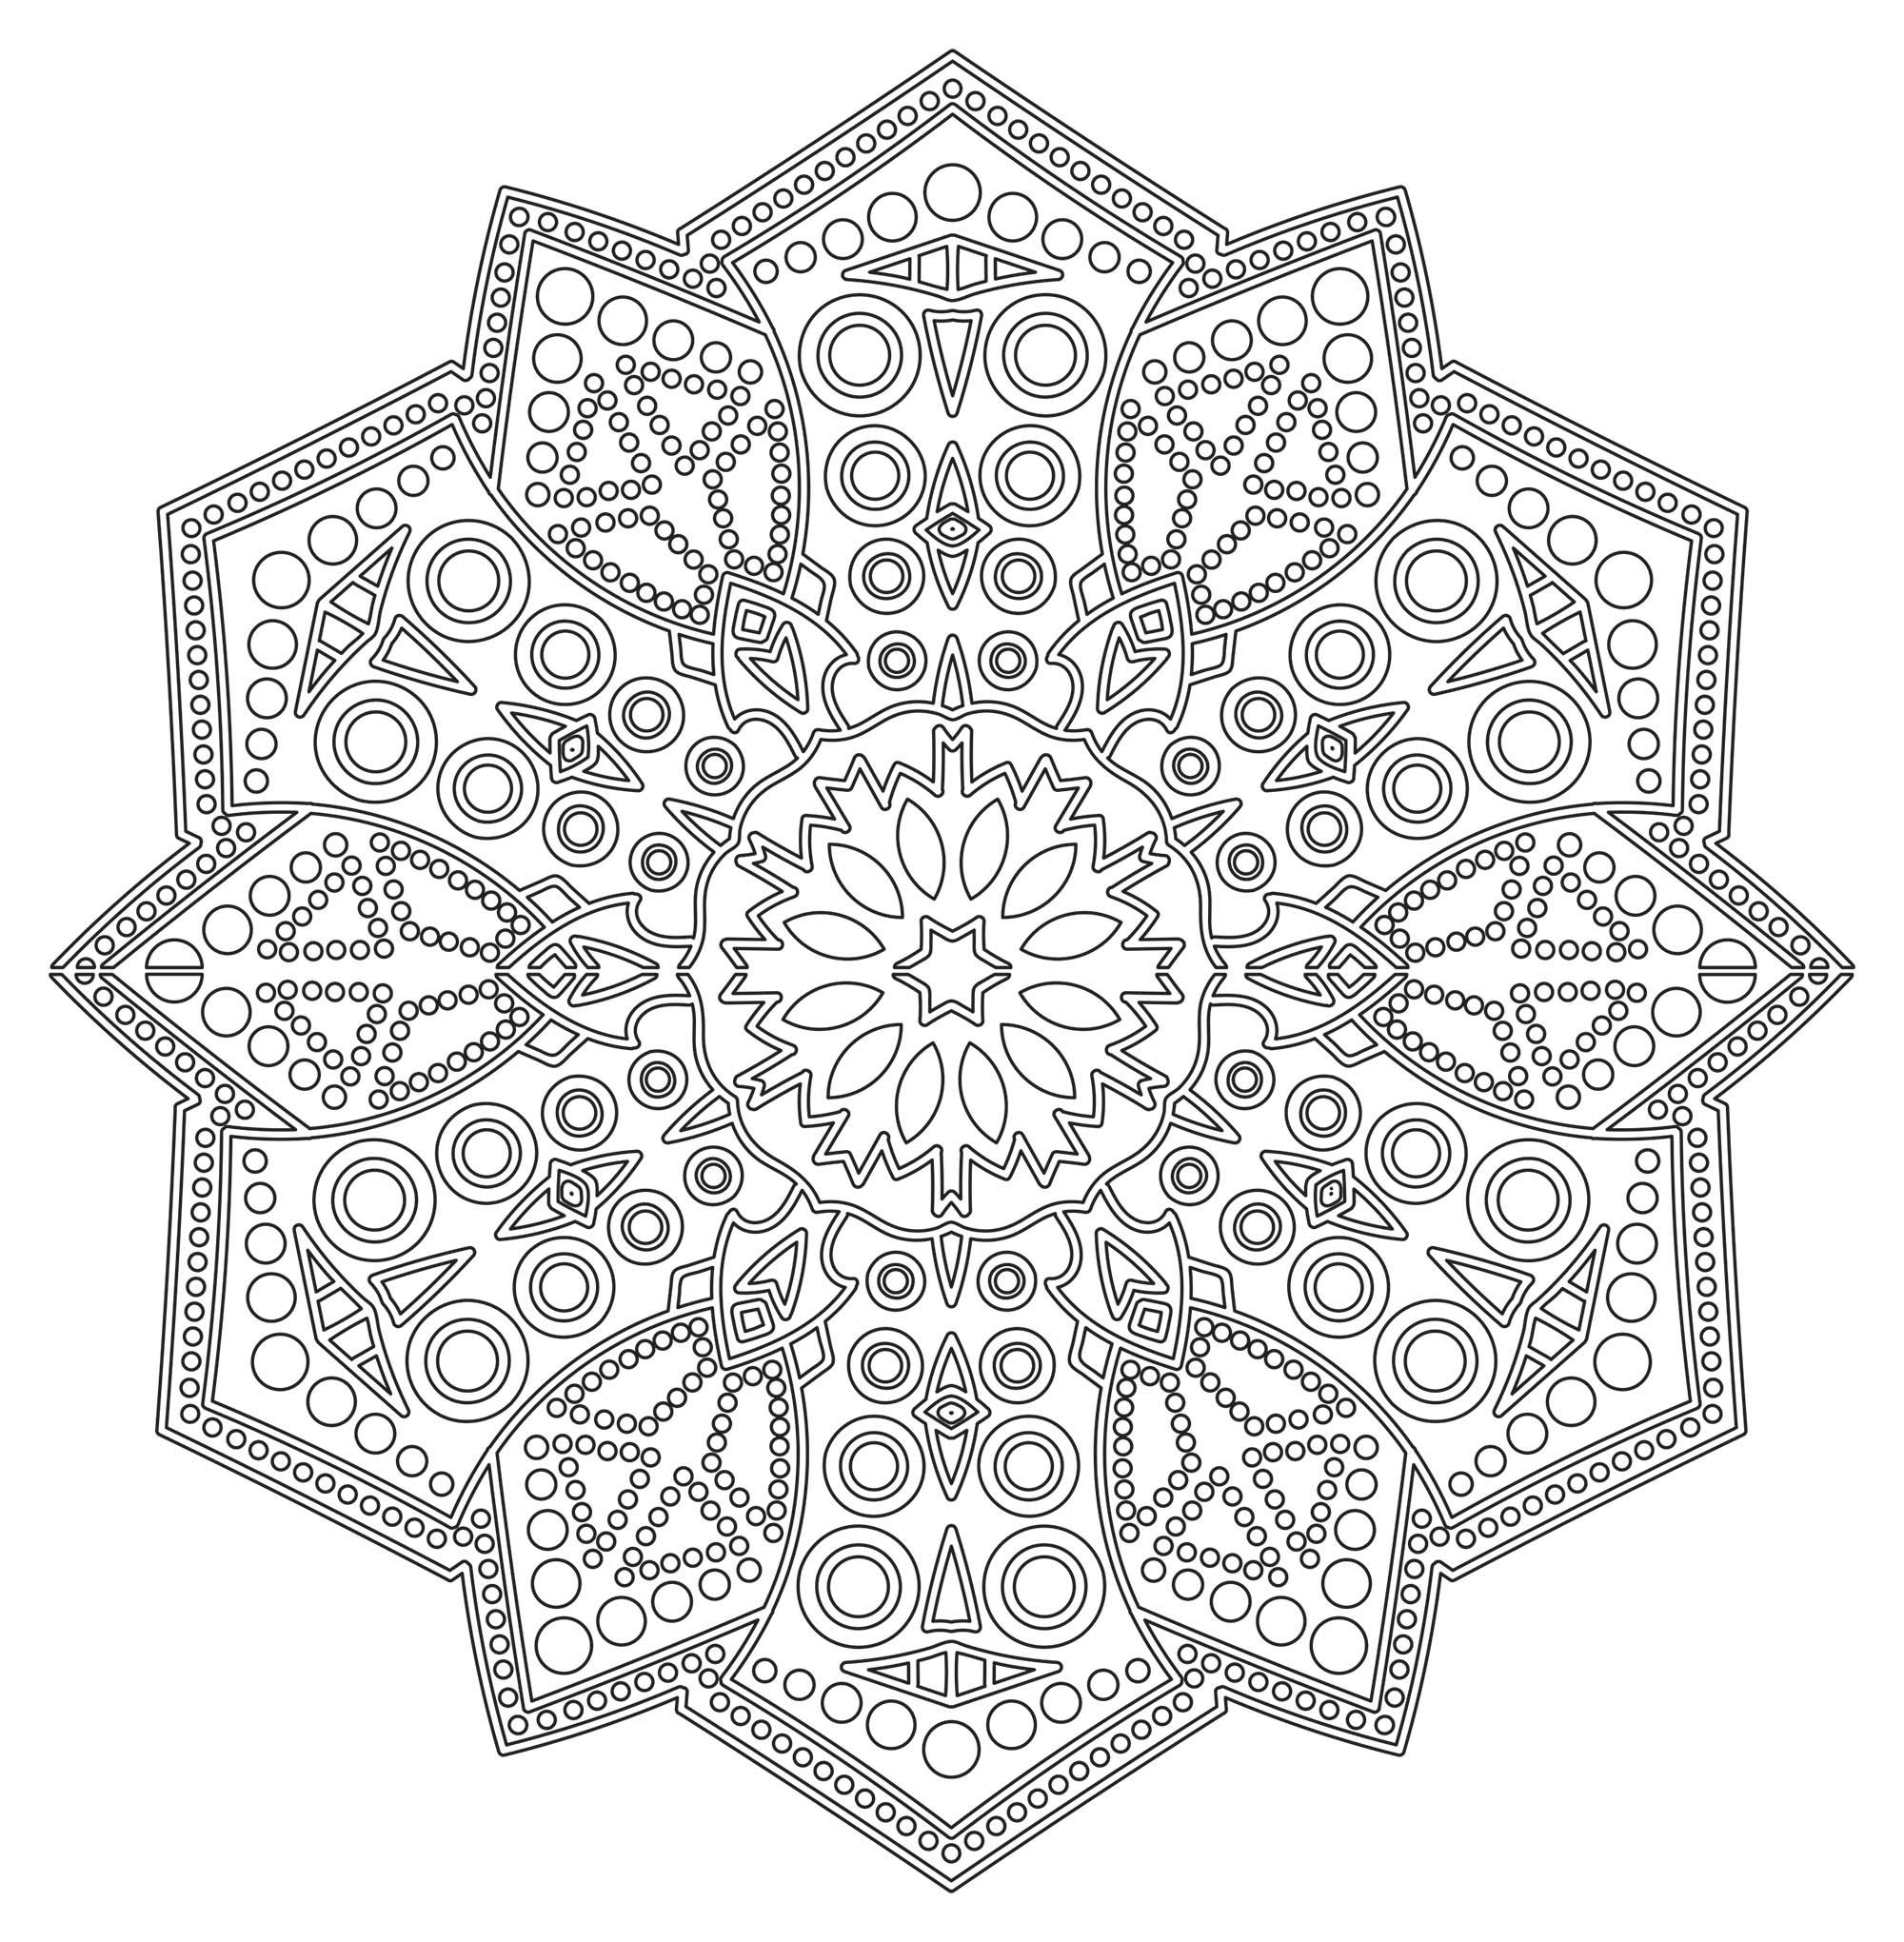 Mandala Zen Antistress 6 Mampalas Adult Coloring Pages